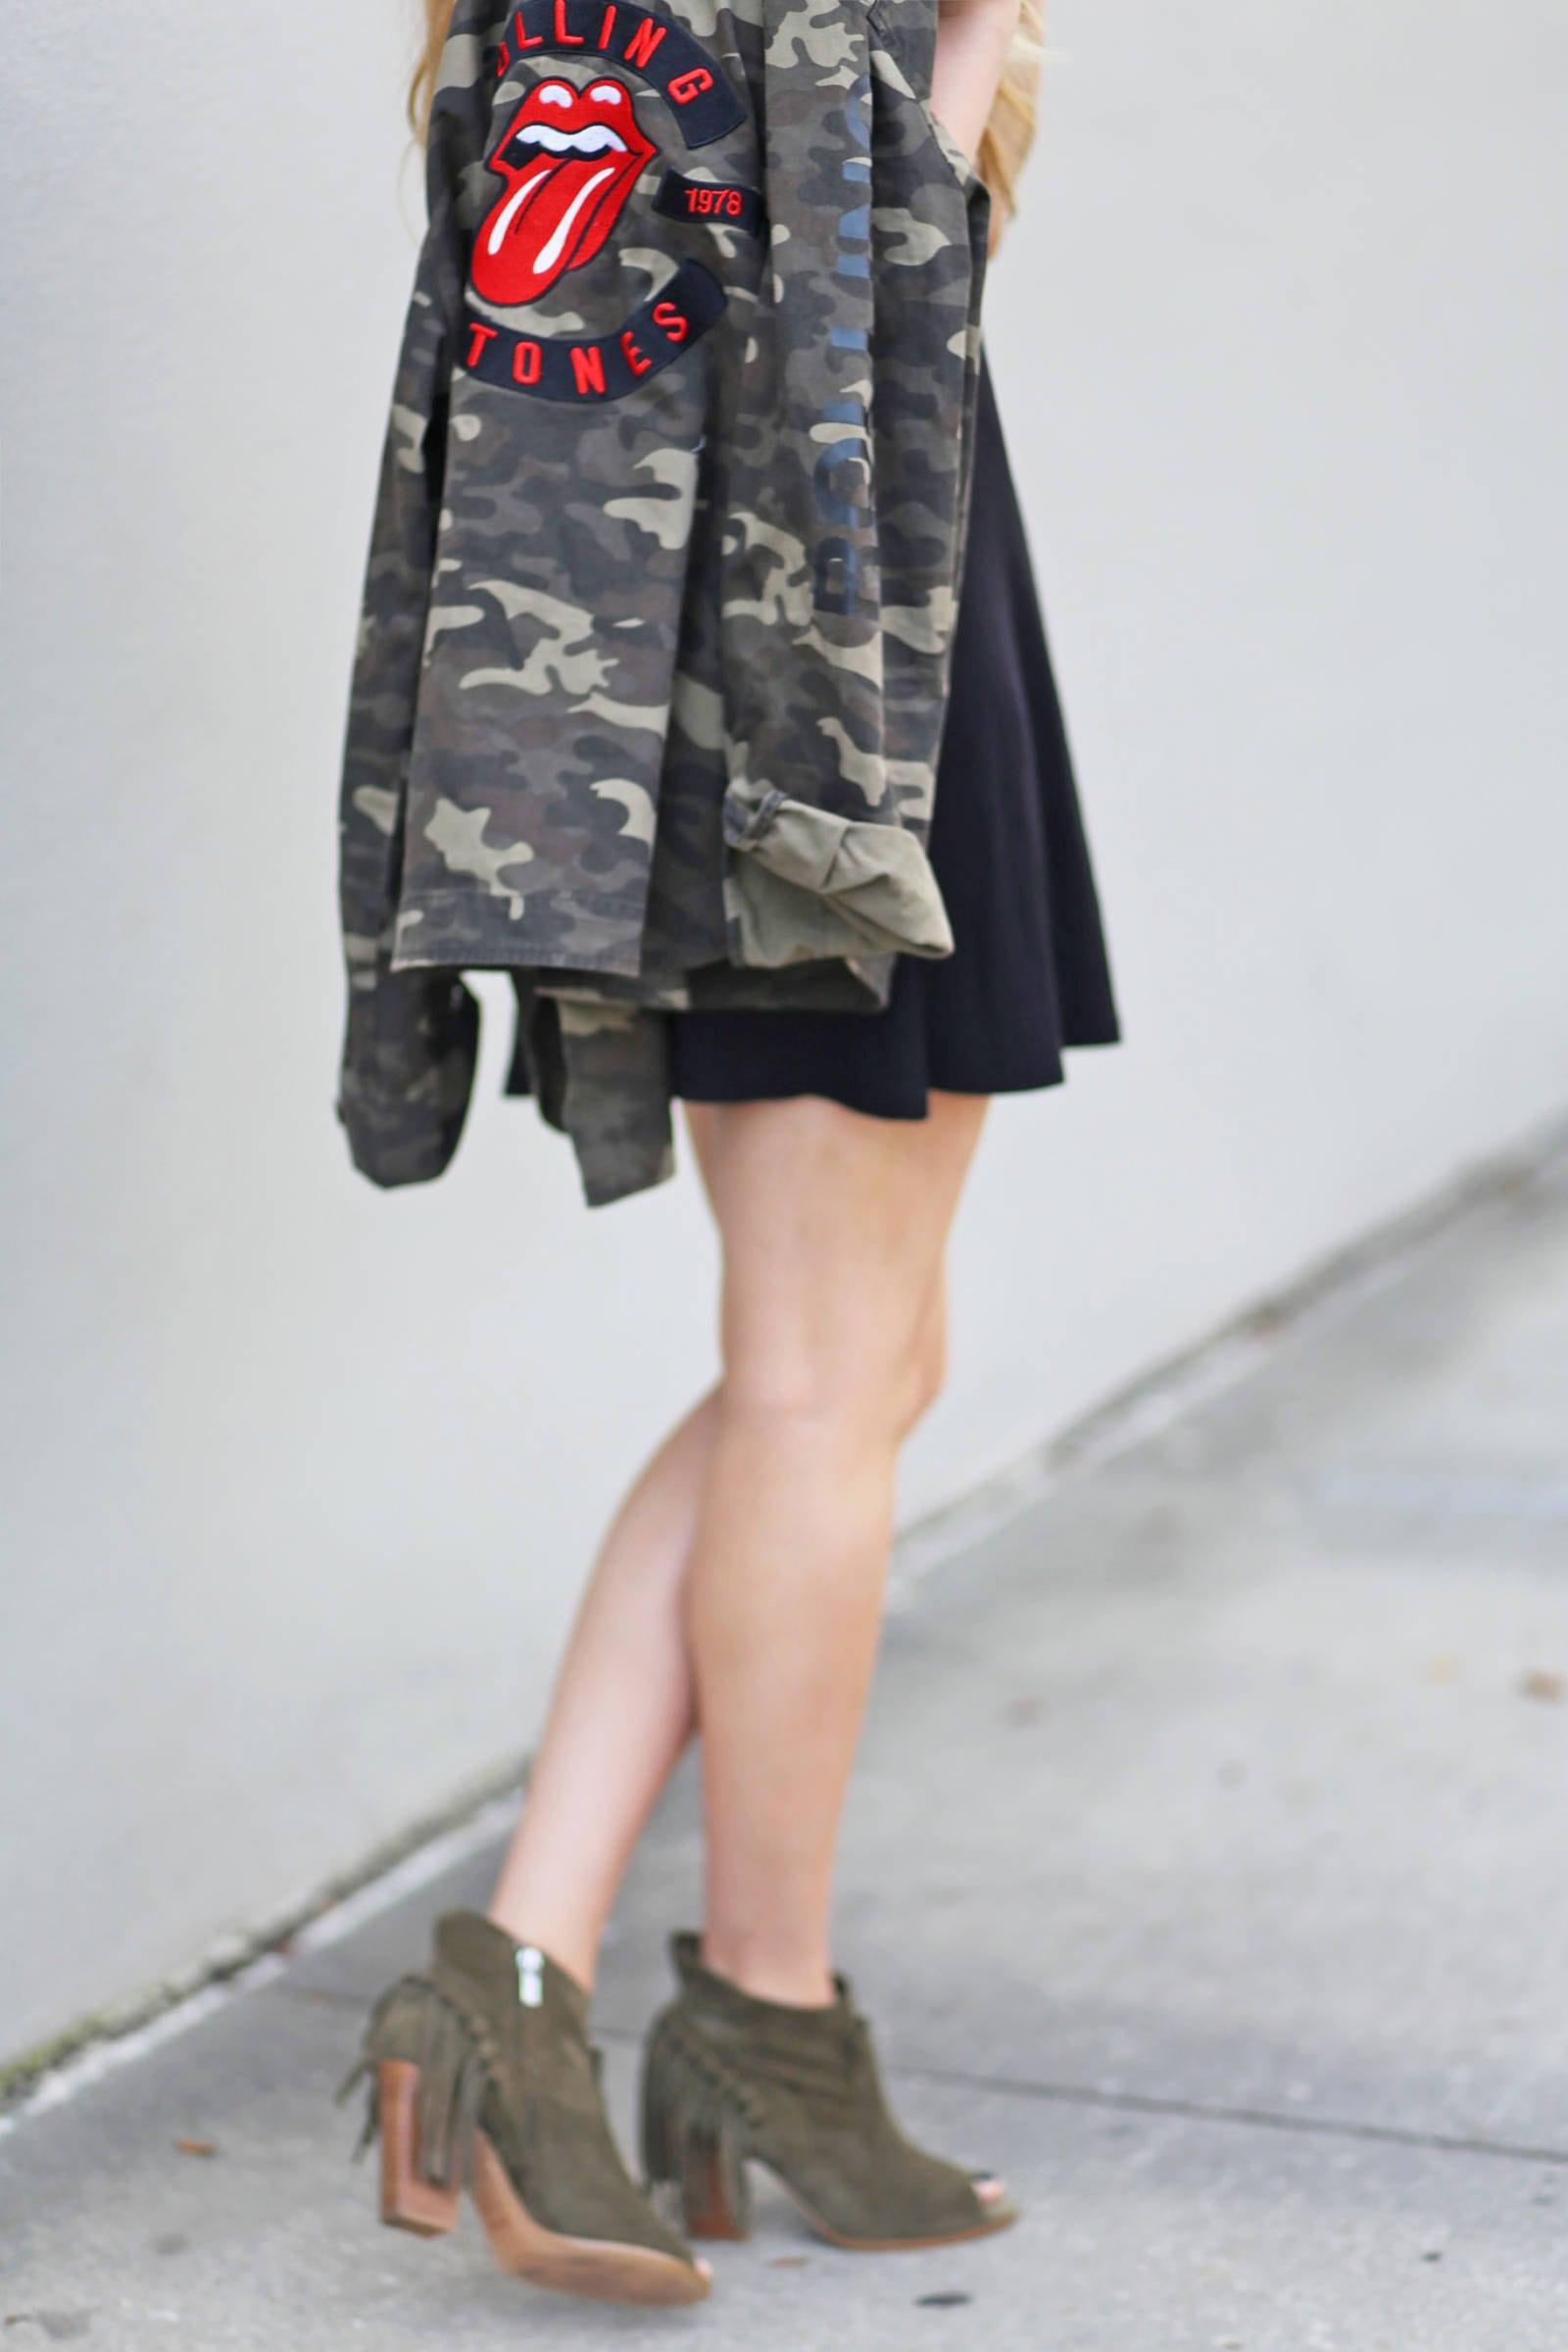 LBD edgy rock and roll vibe | Little black dress | Mash elle beauty blogger | Rolling Stones Camo jacket